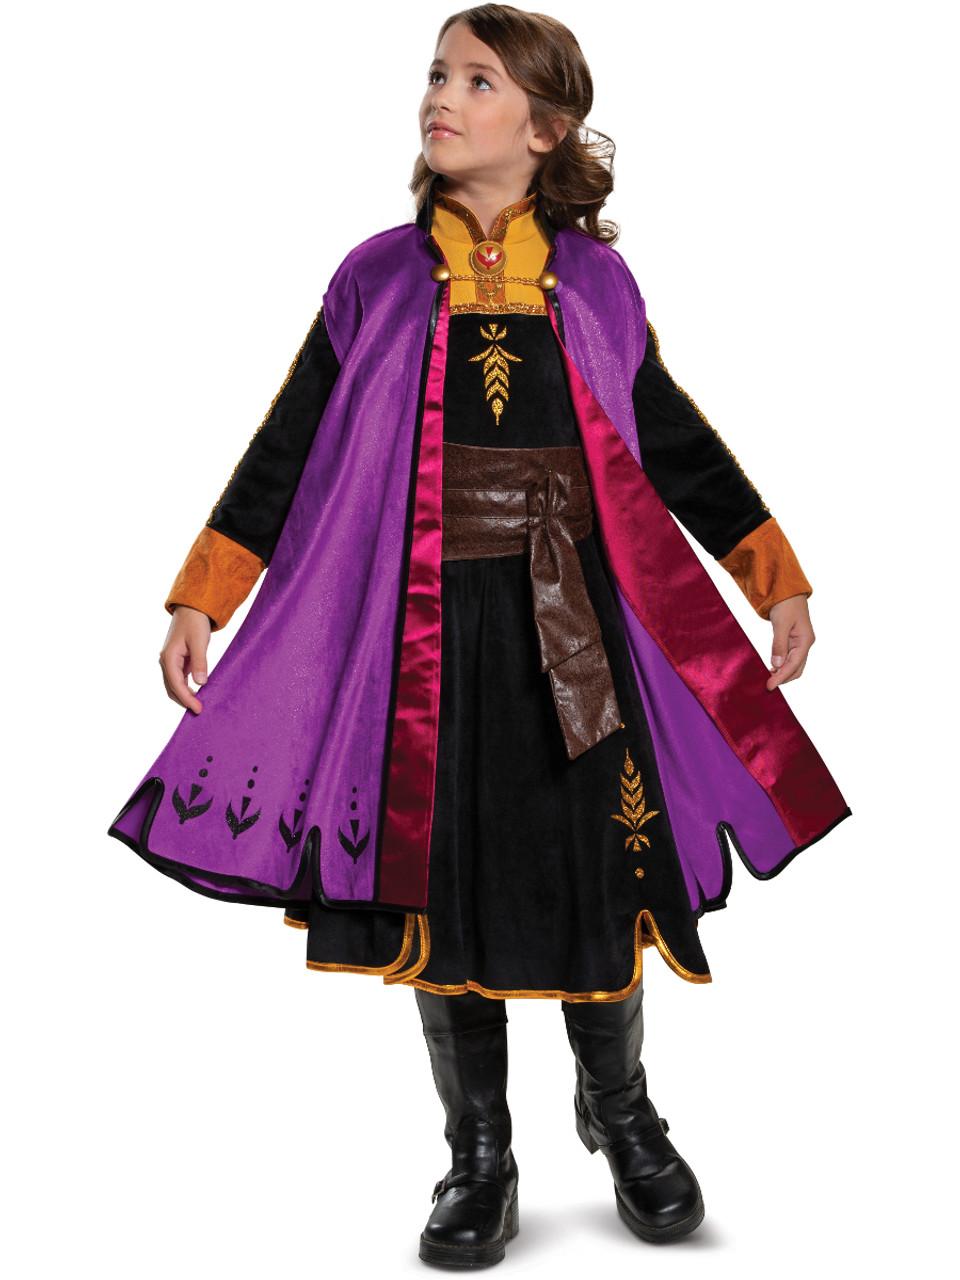 Frozen 2 Anna Prestige Girl's Costume